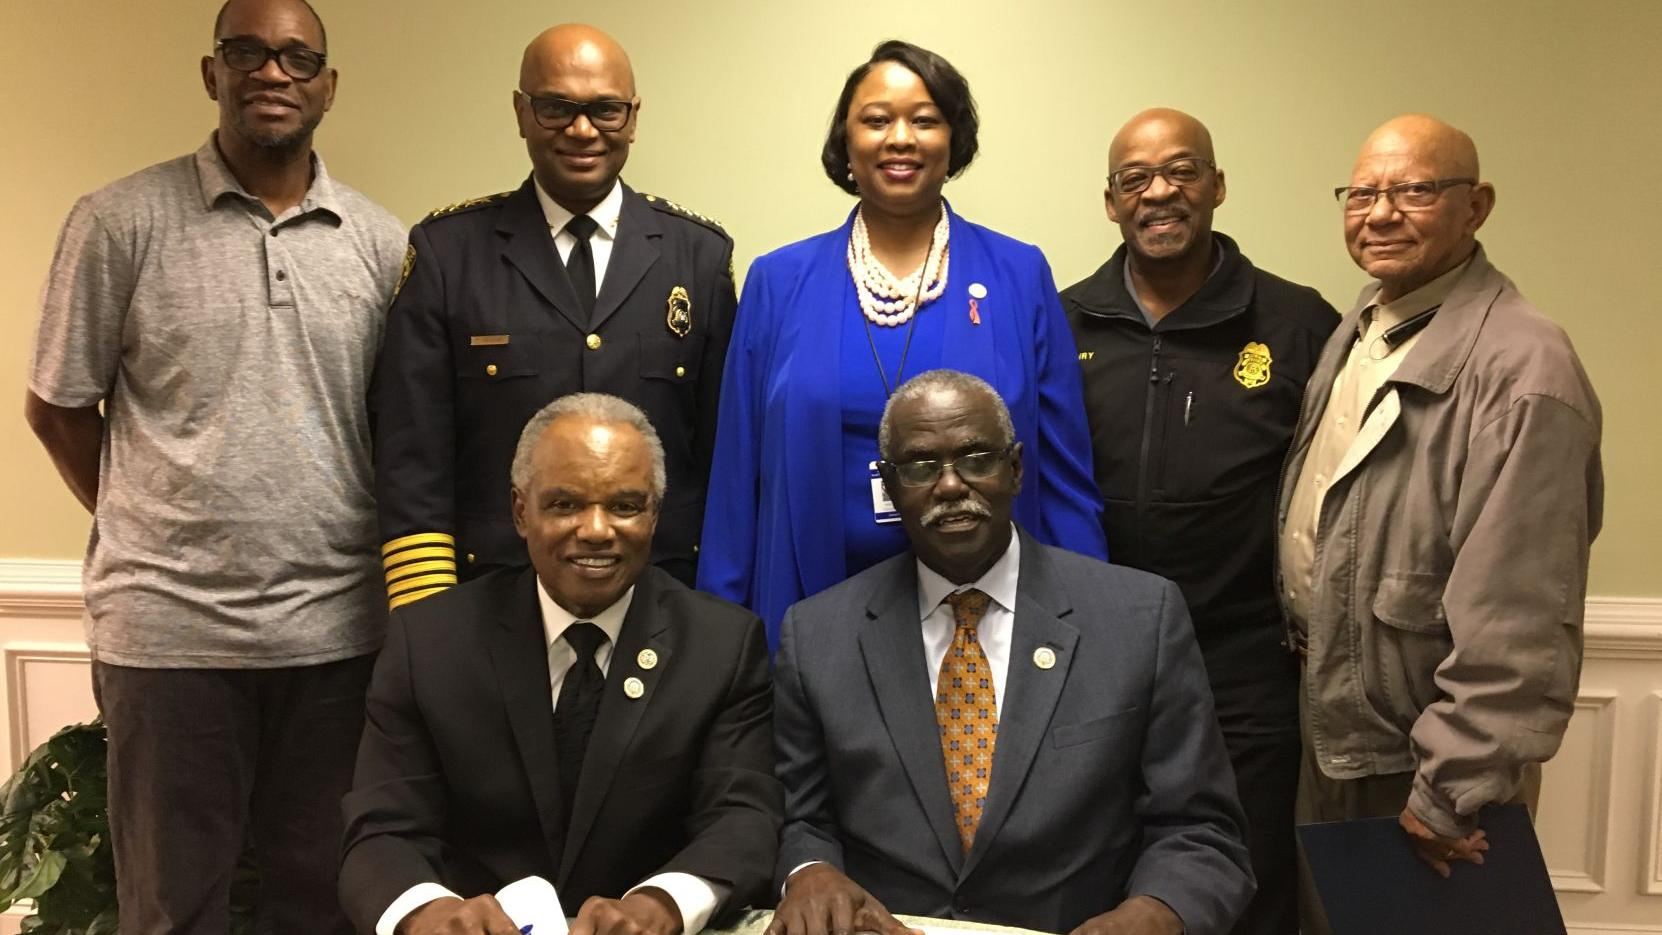 Atlanta Job Corps Center Coming To South Fulton Business Mdjonline Com